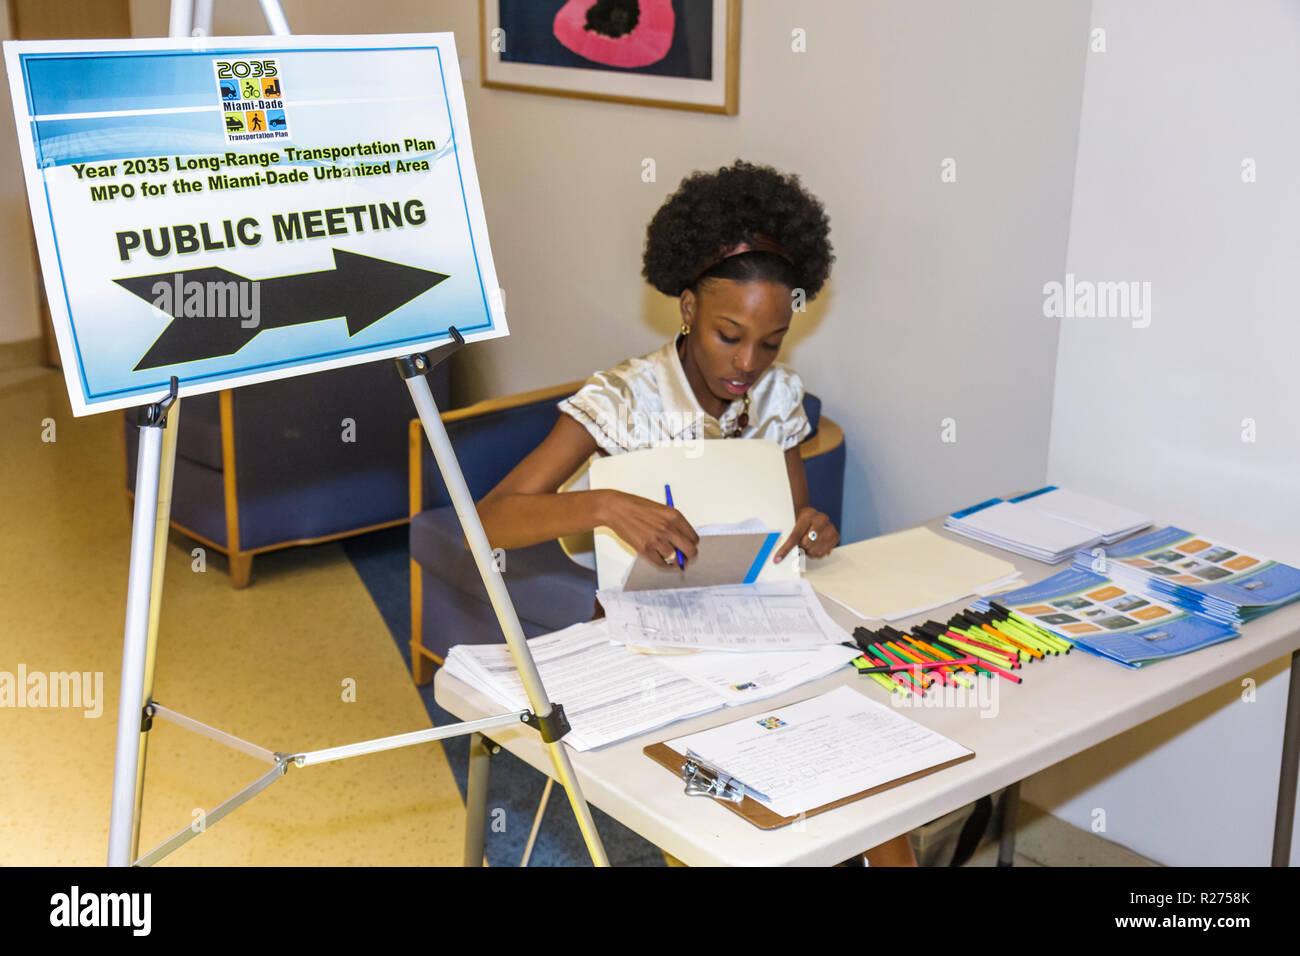 Miami Beach Miami Florida Beach Regional Library Long Range Transportation Plan public meeting survey decision opinion input pol - Stock Image